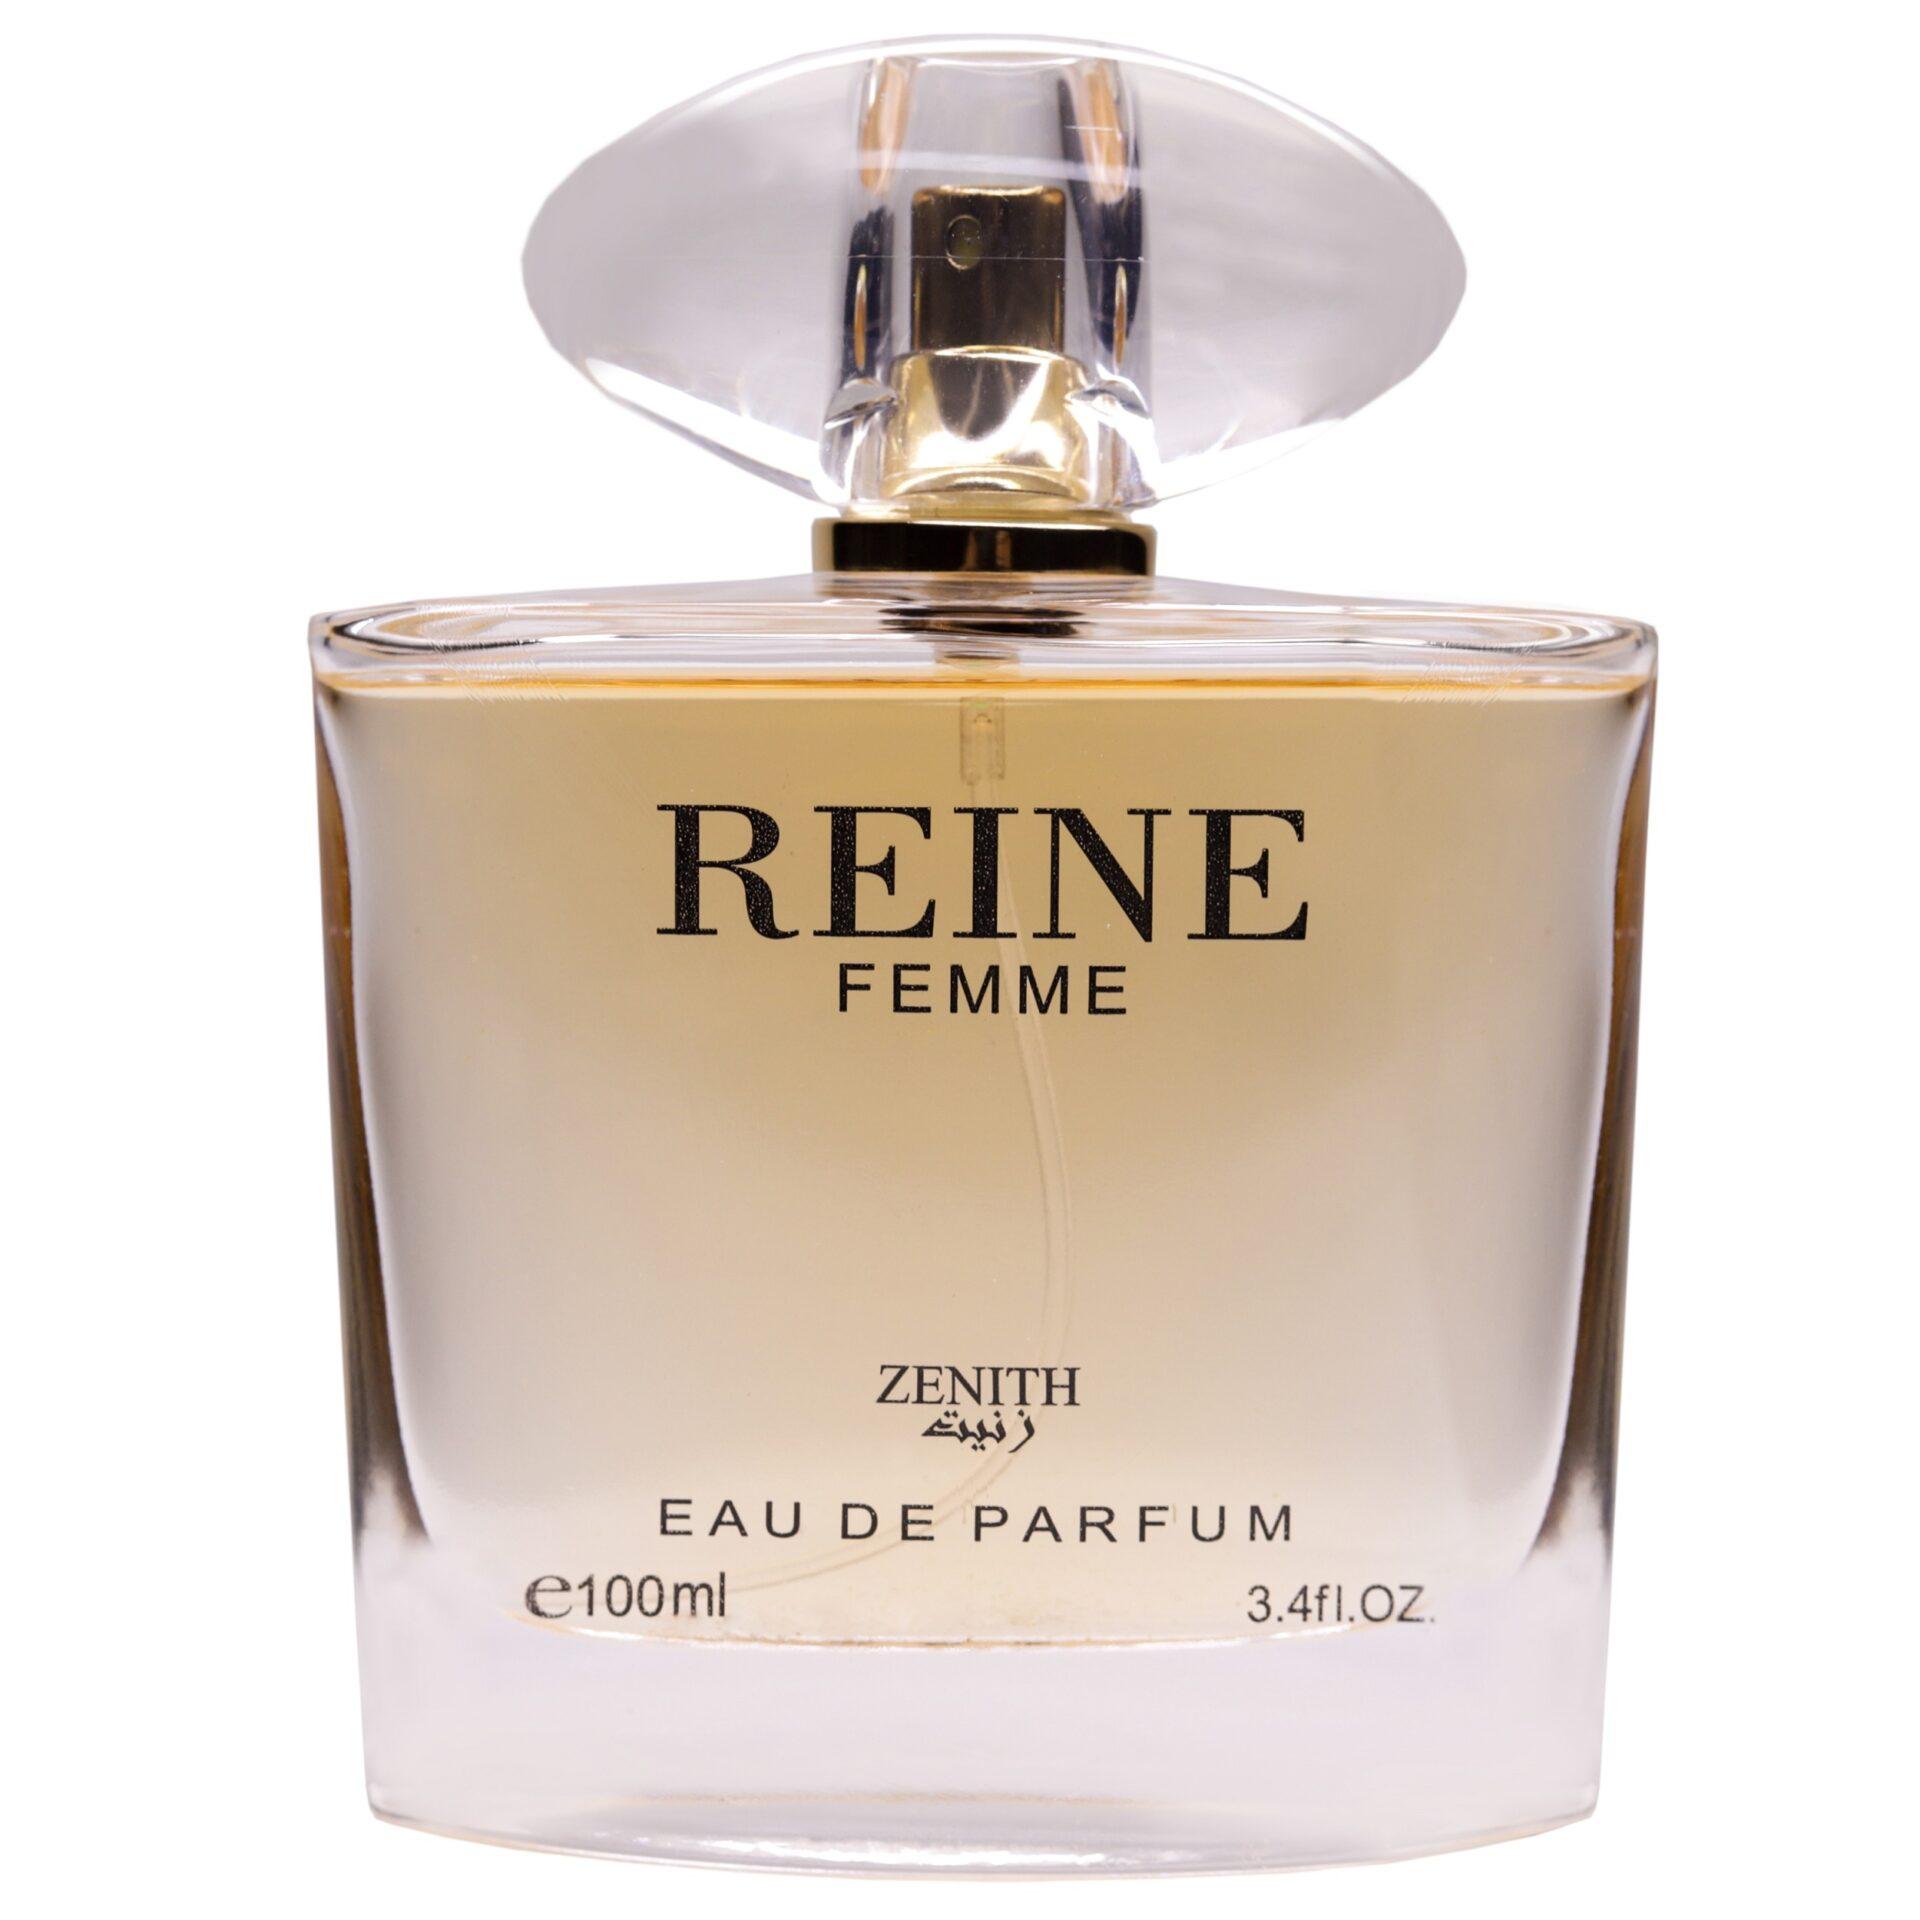 ادو پرفیوم زنانه زنیت مدل Reine حجم 100 میلی لیتر